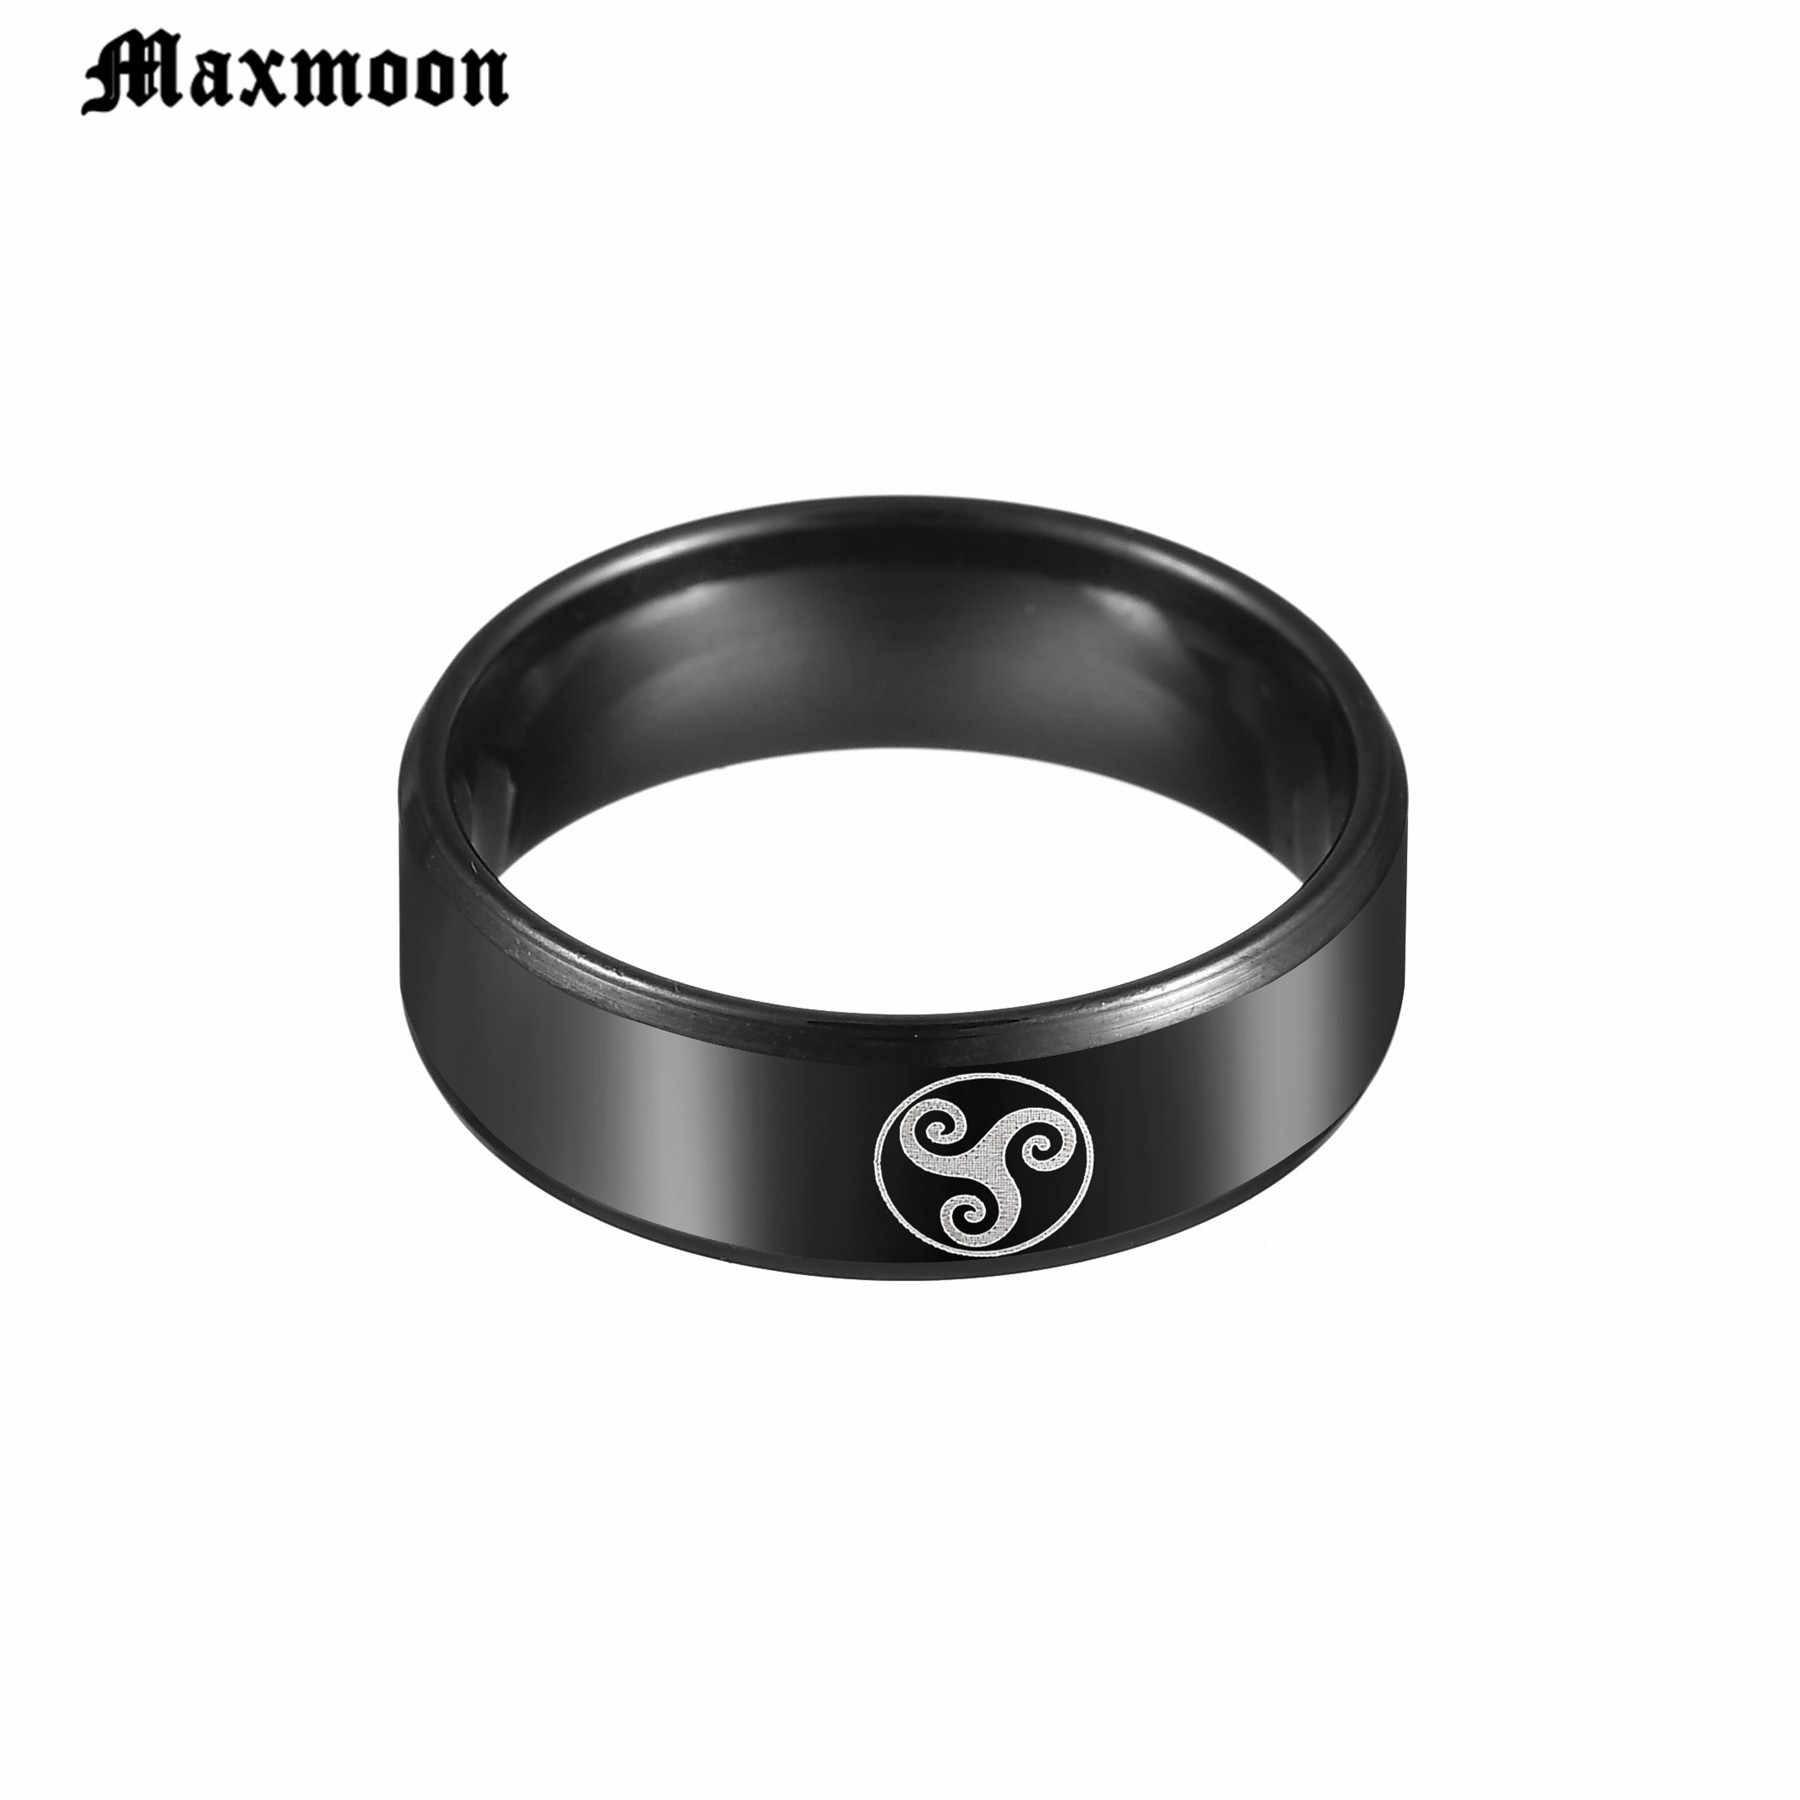 Maxmoon Black Teen Wolf โลโก้แหวนไทเทเนียมชายแฟนหนังผู้ชายแหวนเครื่องประดับของขวัญ